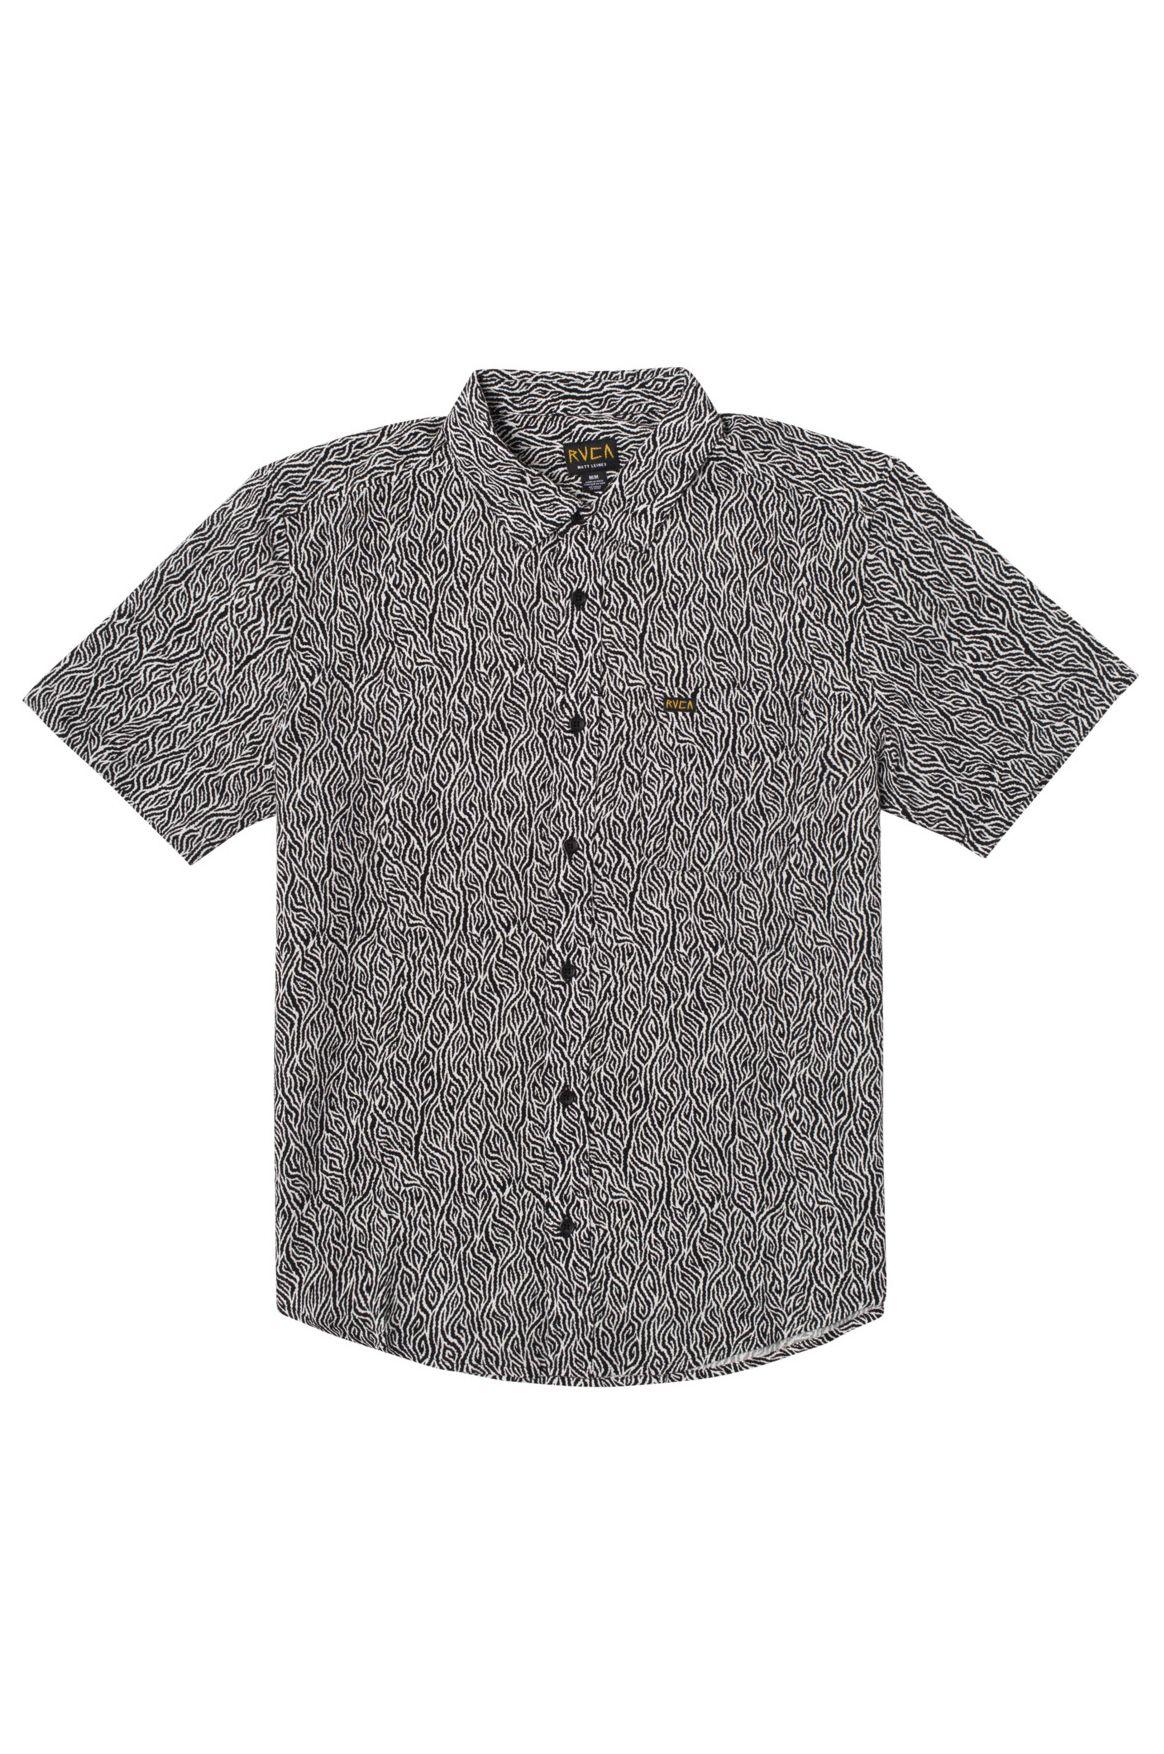 Camisa RVCA MATT LEINES SS Black/White